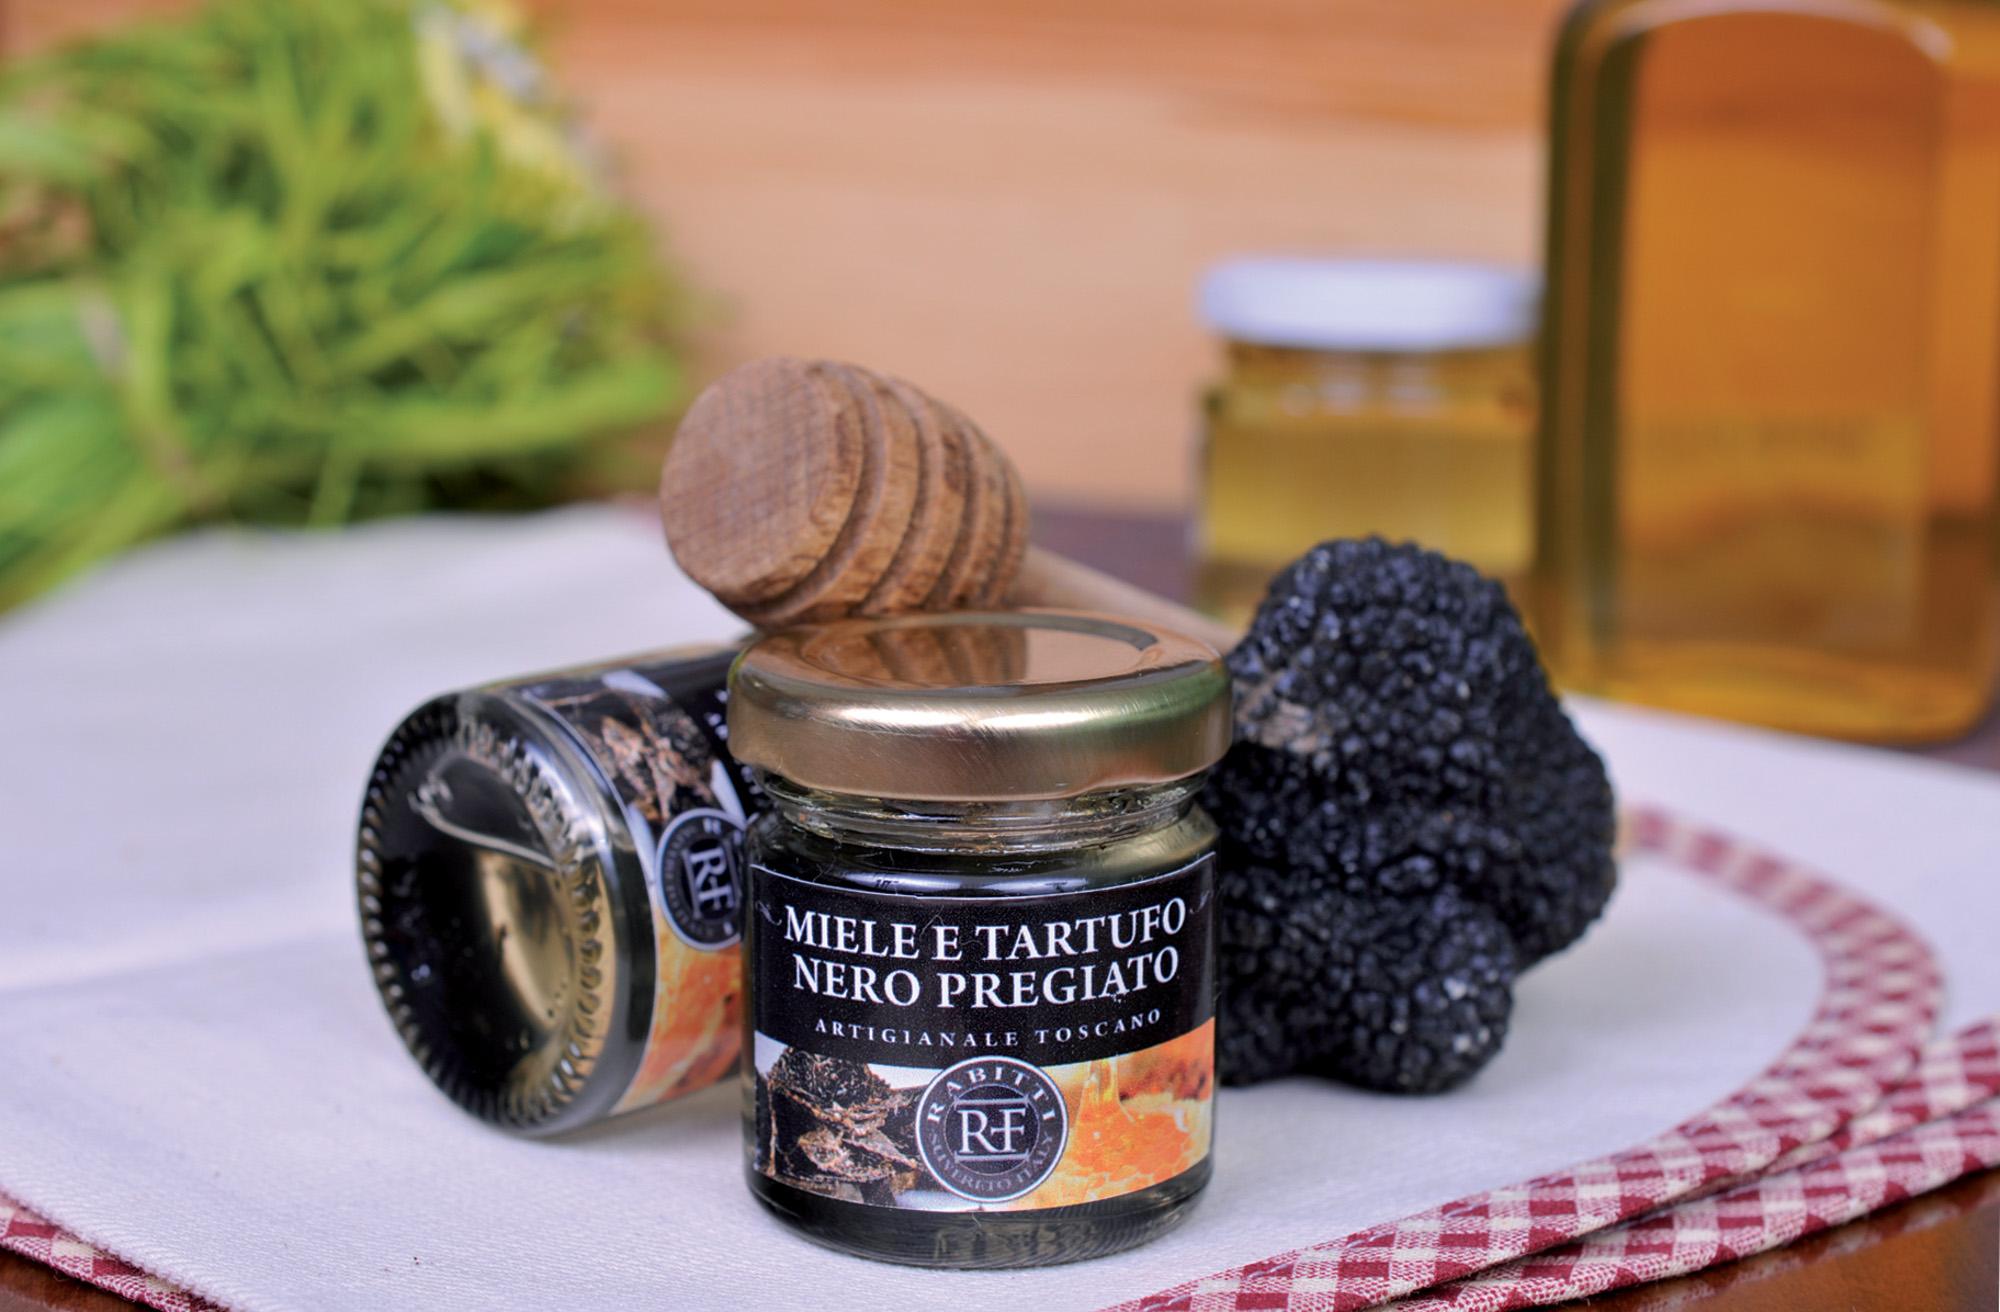 Truffelhoning met Pregiato zwarte truffel van Azienda Agricola Rabitti truffelproducten